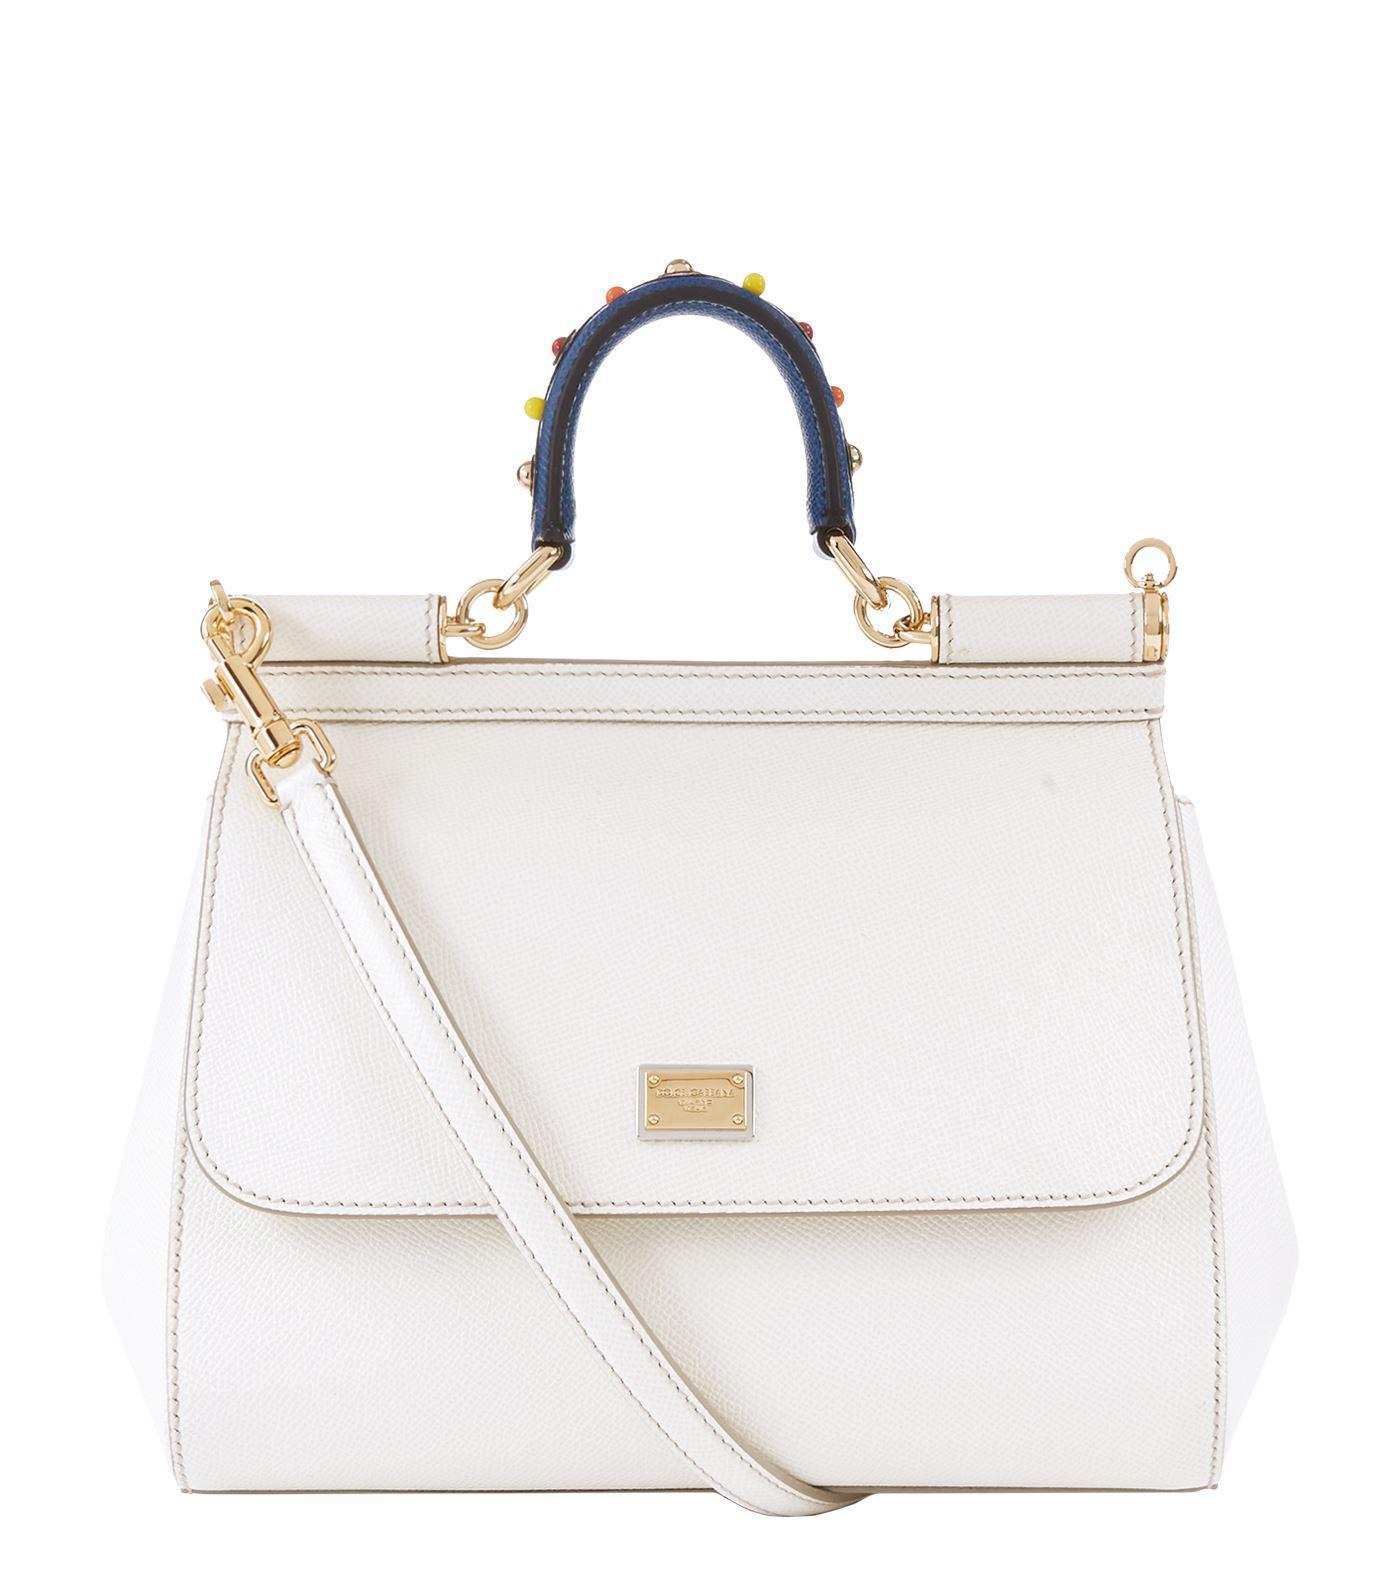 2341e1fd2a1d Dolce   Gabbana Medium Leather Appliqu Handle Sicily Bag in White - Lyst